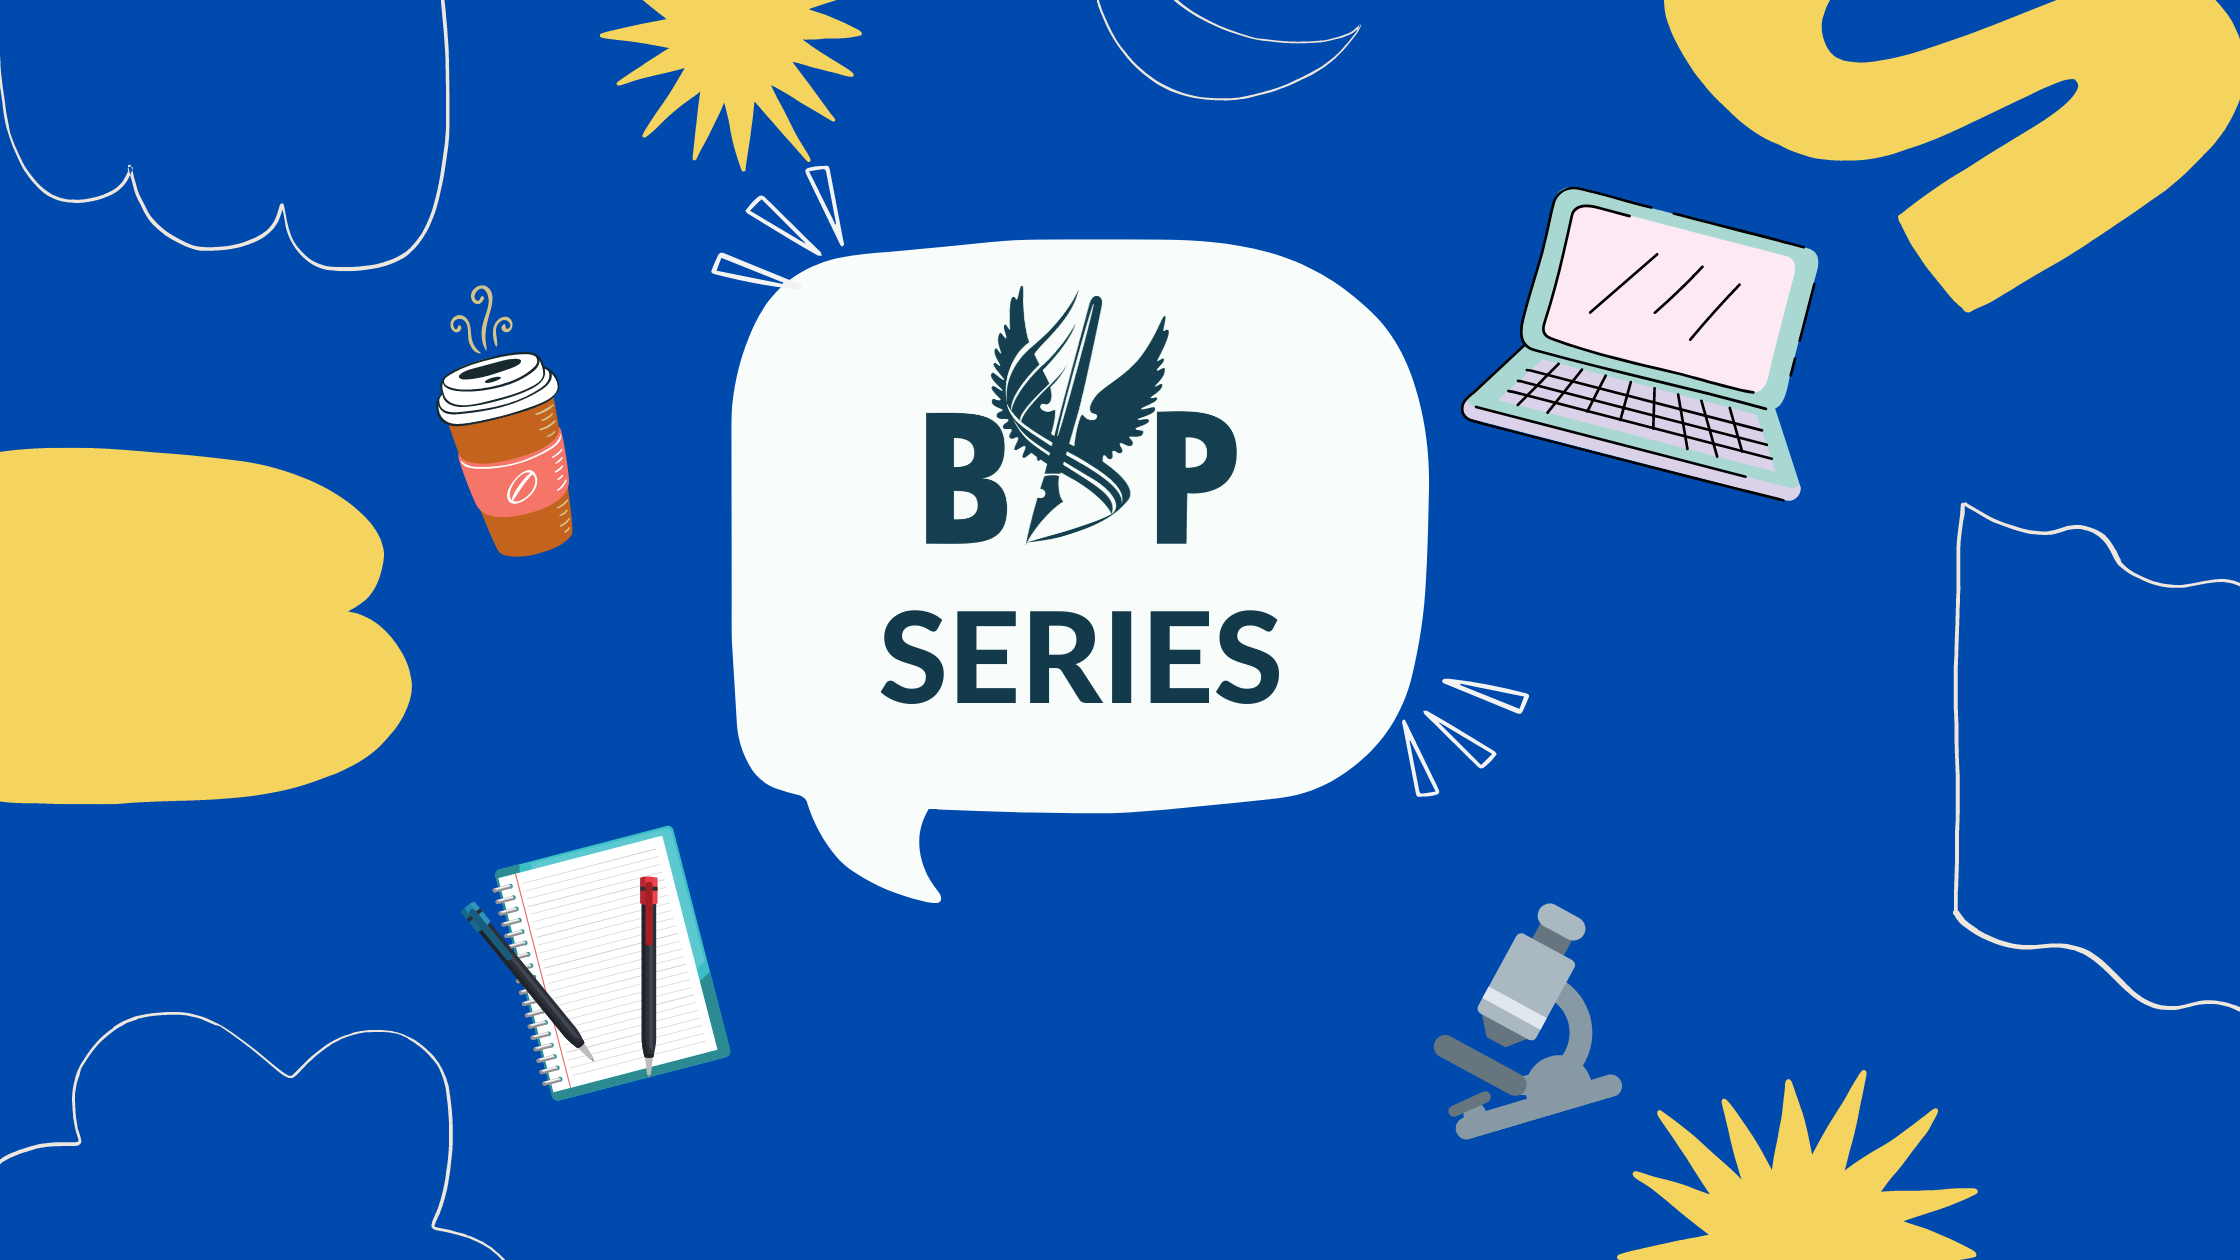 BSP Series